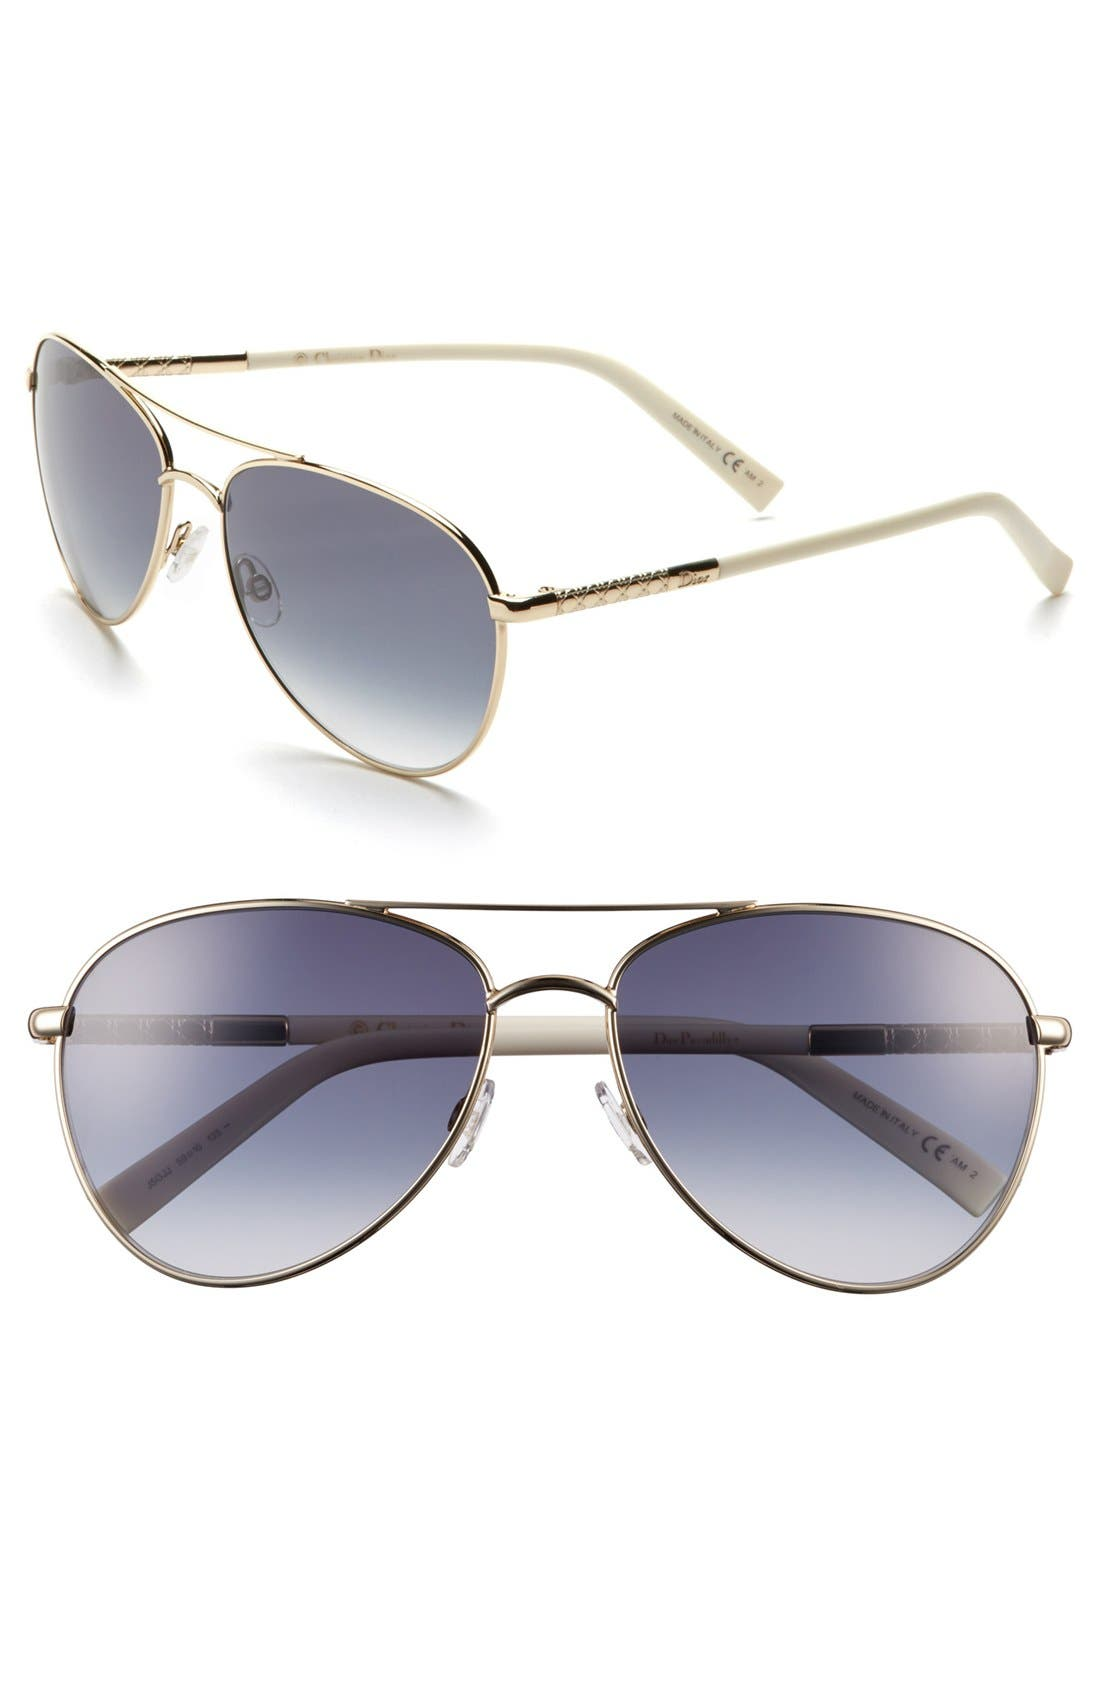 Main Image - Dior 'Picadilly 2' 59mm Metal Aviator Sunglasses